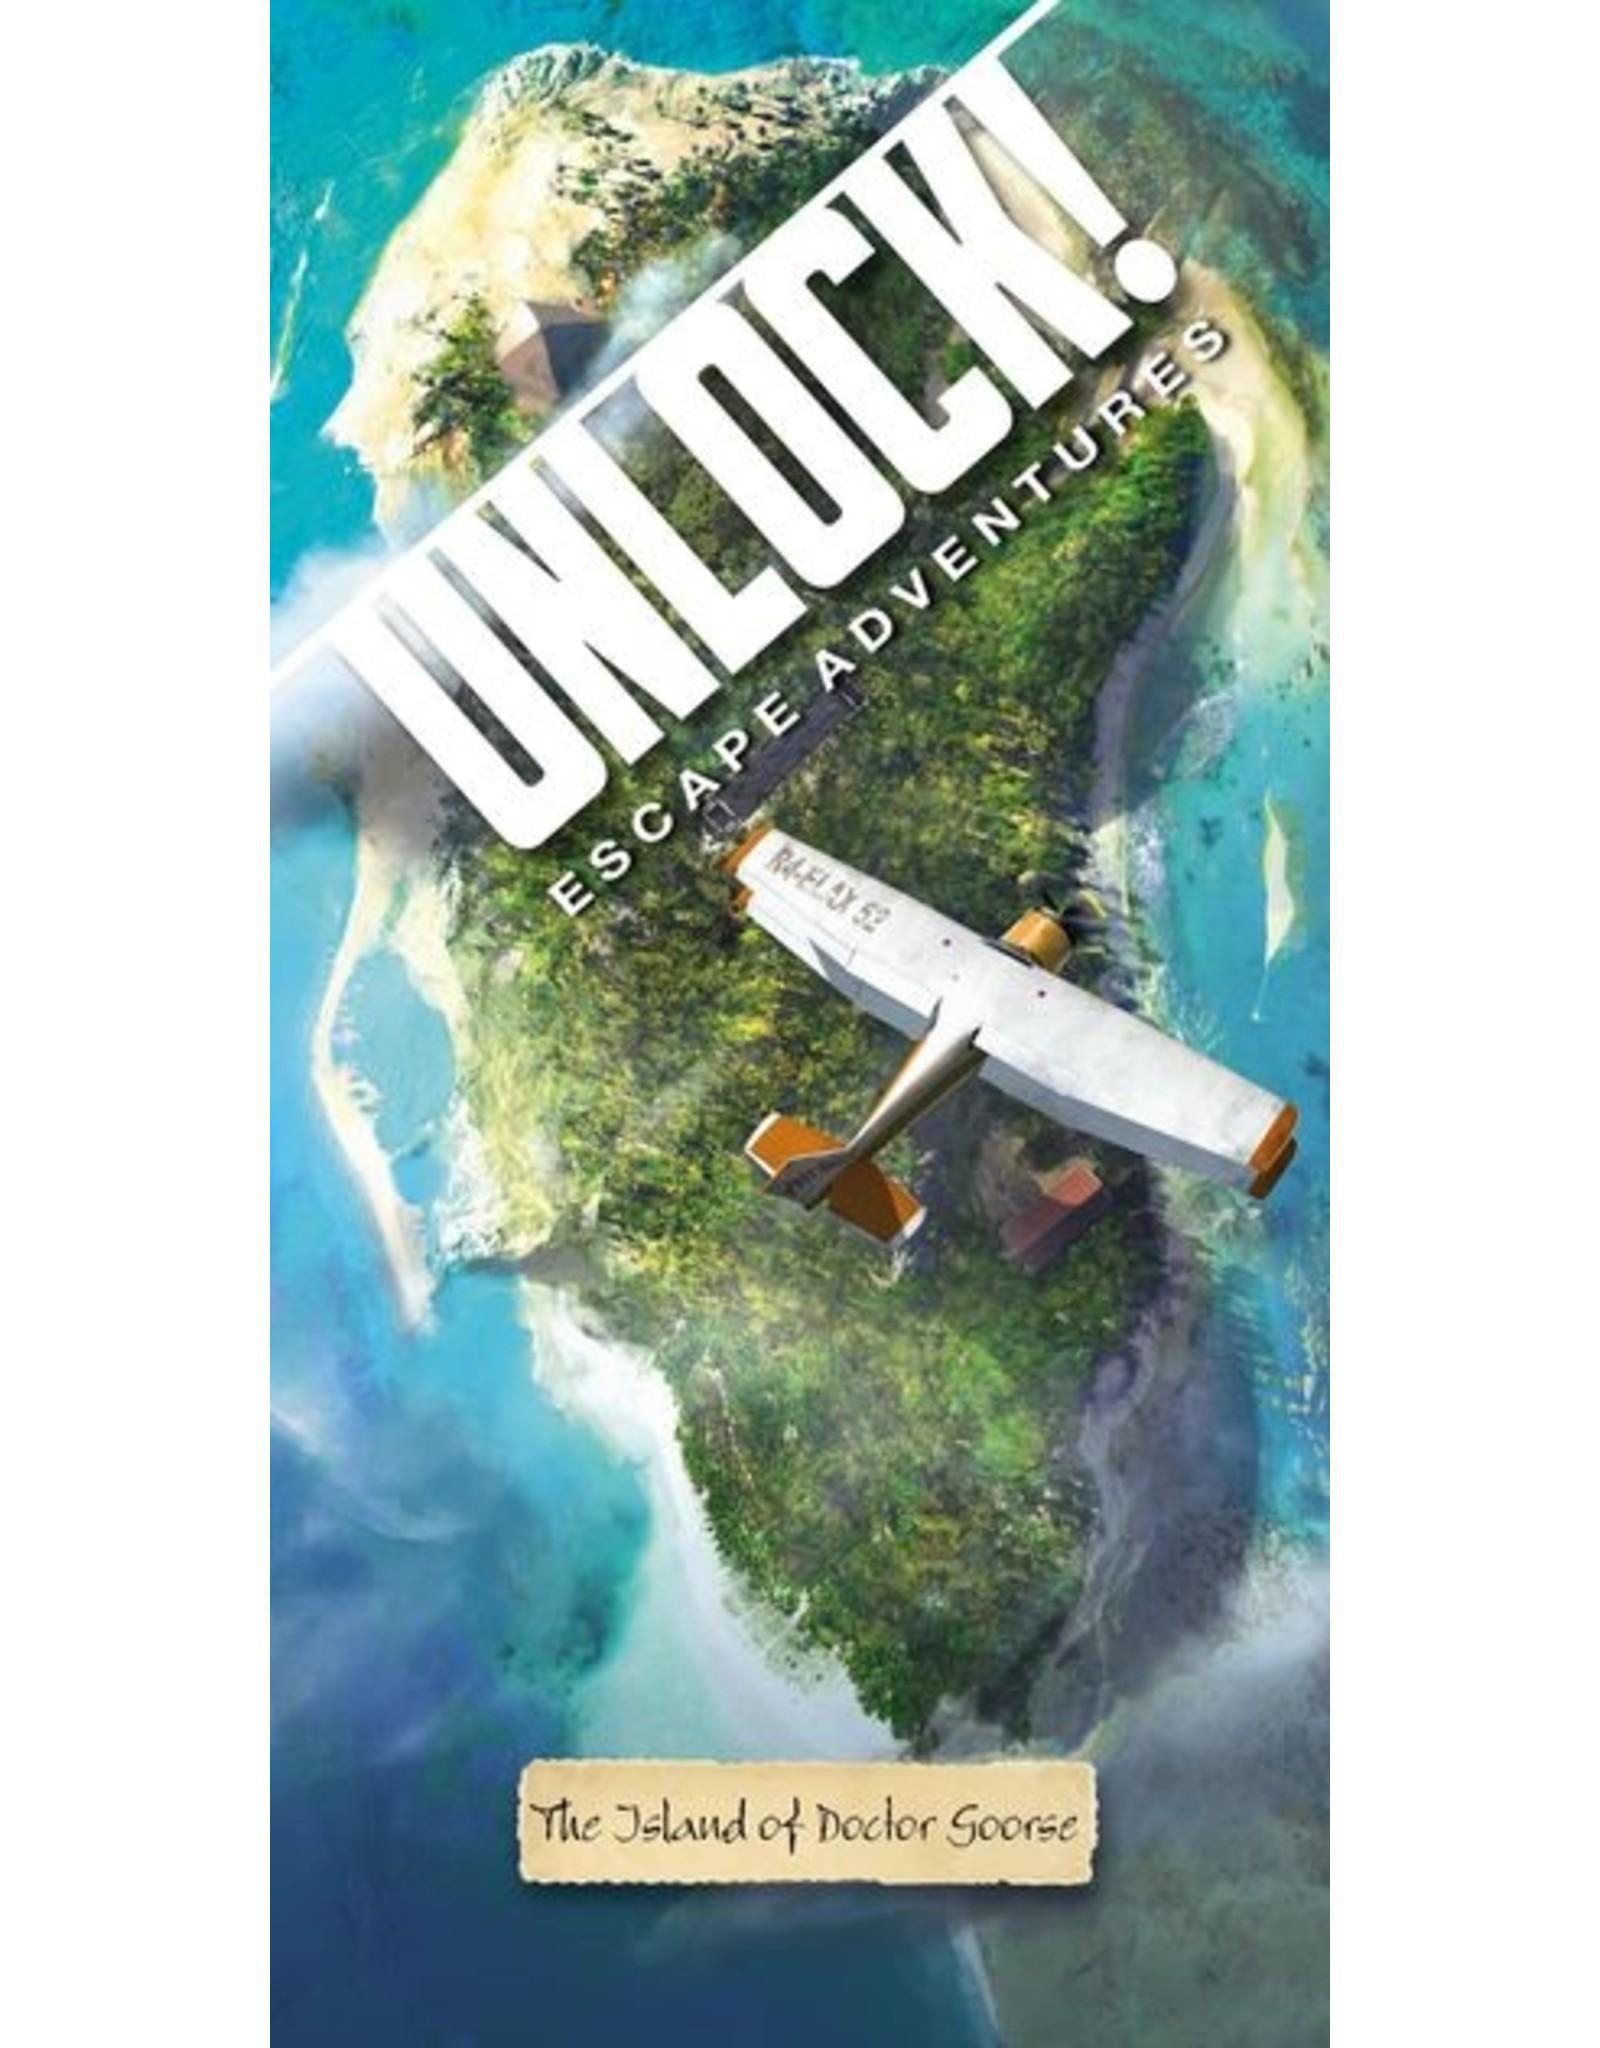 Asmodee Unlock!: The Island of Doctor Goorse